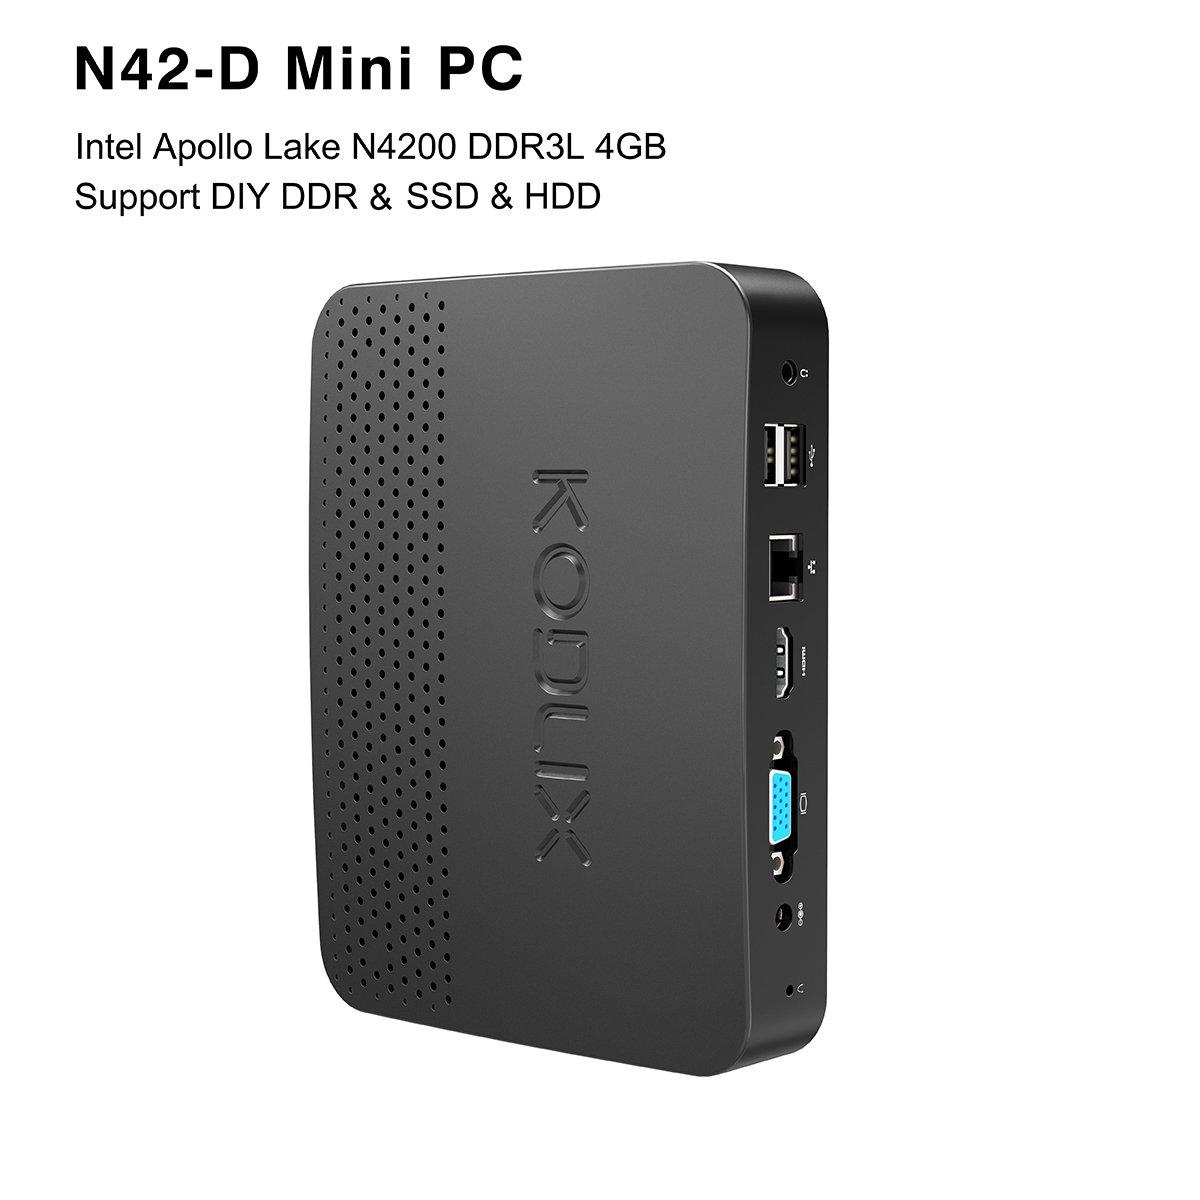 KODLIX N42-D Fanless Mini PC, Intel Pentium Apollo Lake N4200 (up to 2.5 GHz) Windows 10 Pro 64-Bit /4GB Ram Installed (Expandable DDR Via 2xSODIMM, Max 8GBx2)/SSD&HDD Slot/Gigabit Ethernet/USB-C/NAS